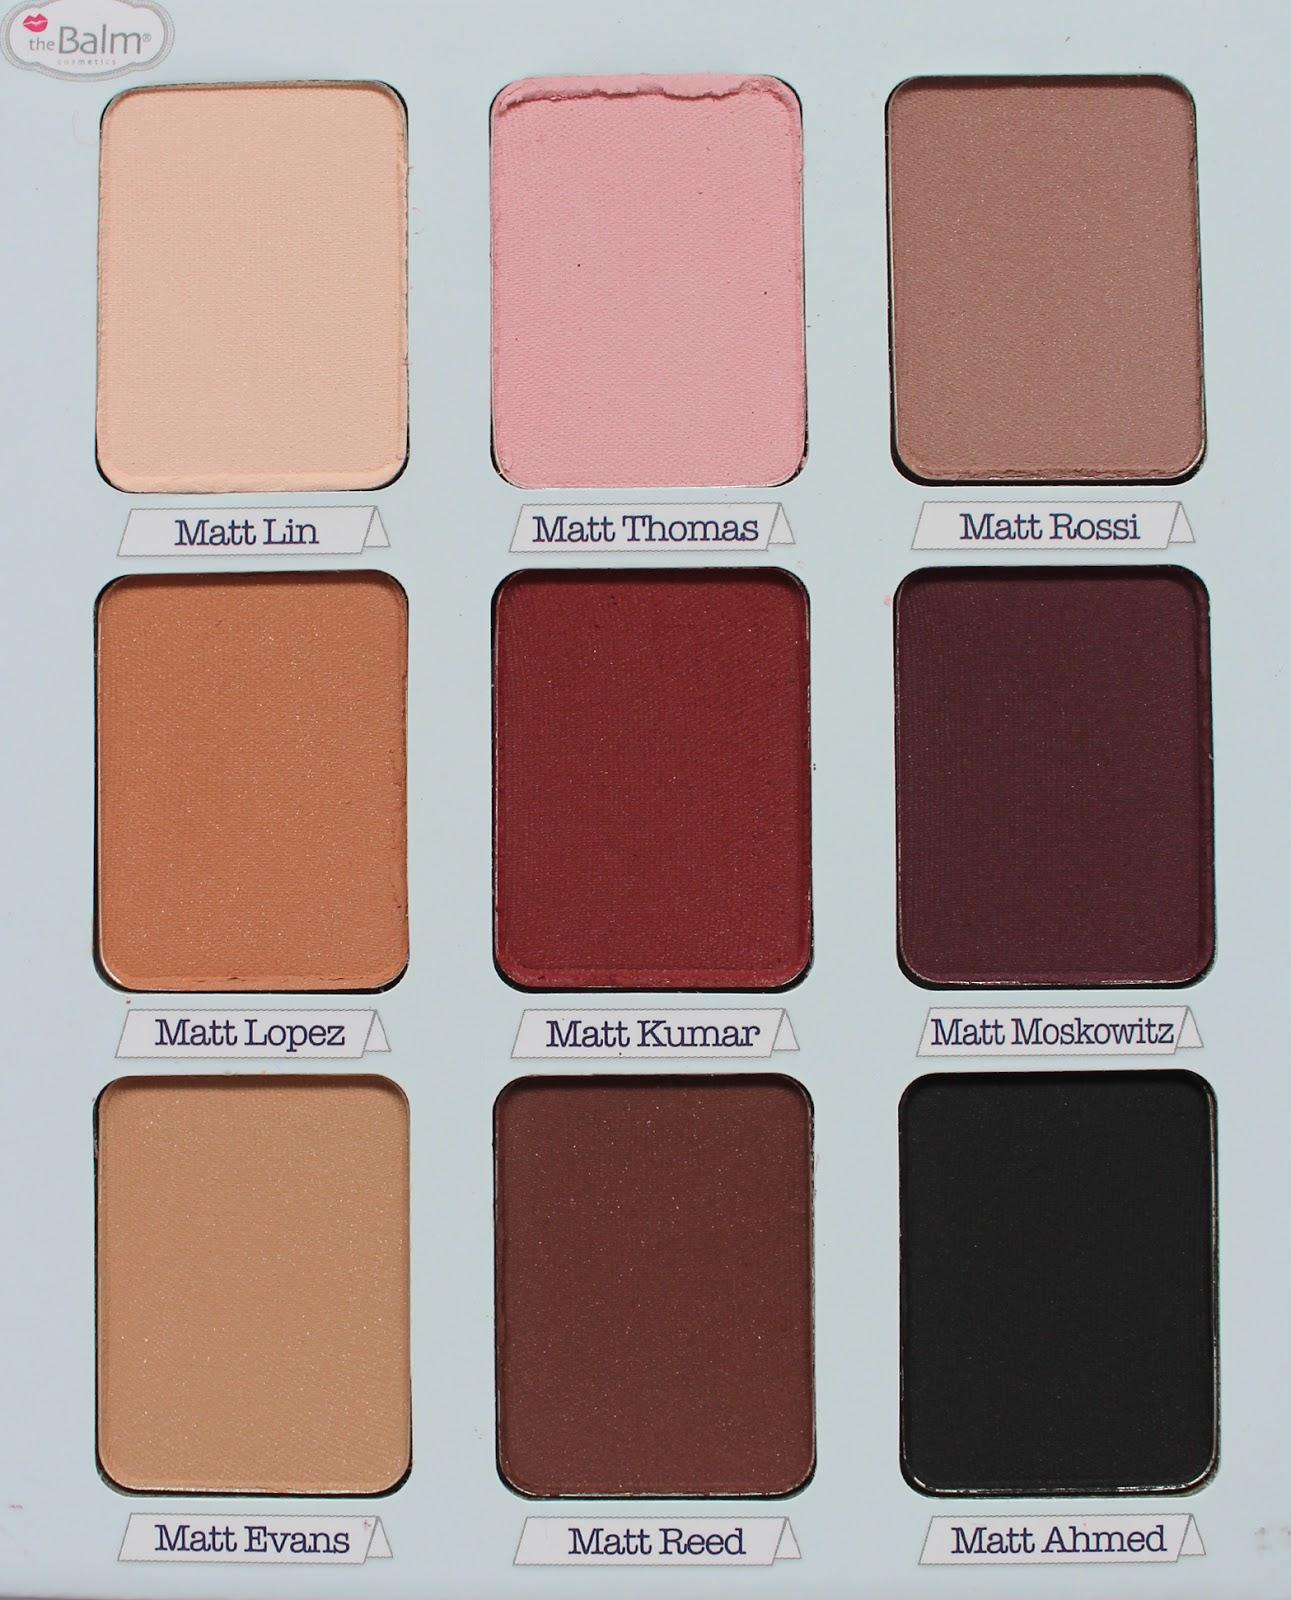 THEBALM   Meet Matt(e) Trimony Matte Eyeshadow Palette - Review + Swatches - CassandraMyee